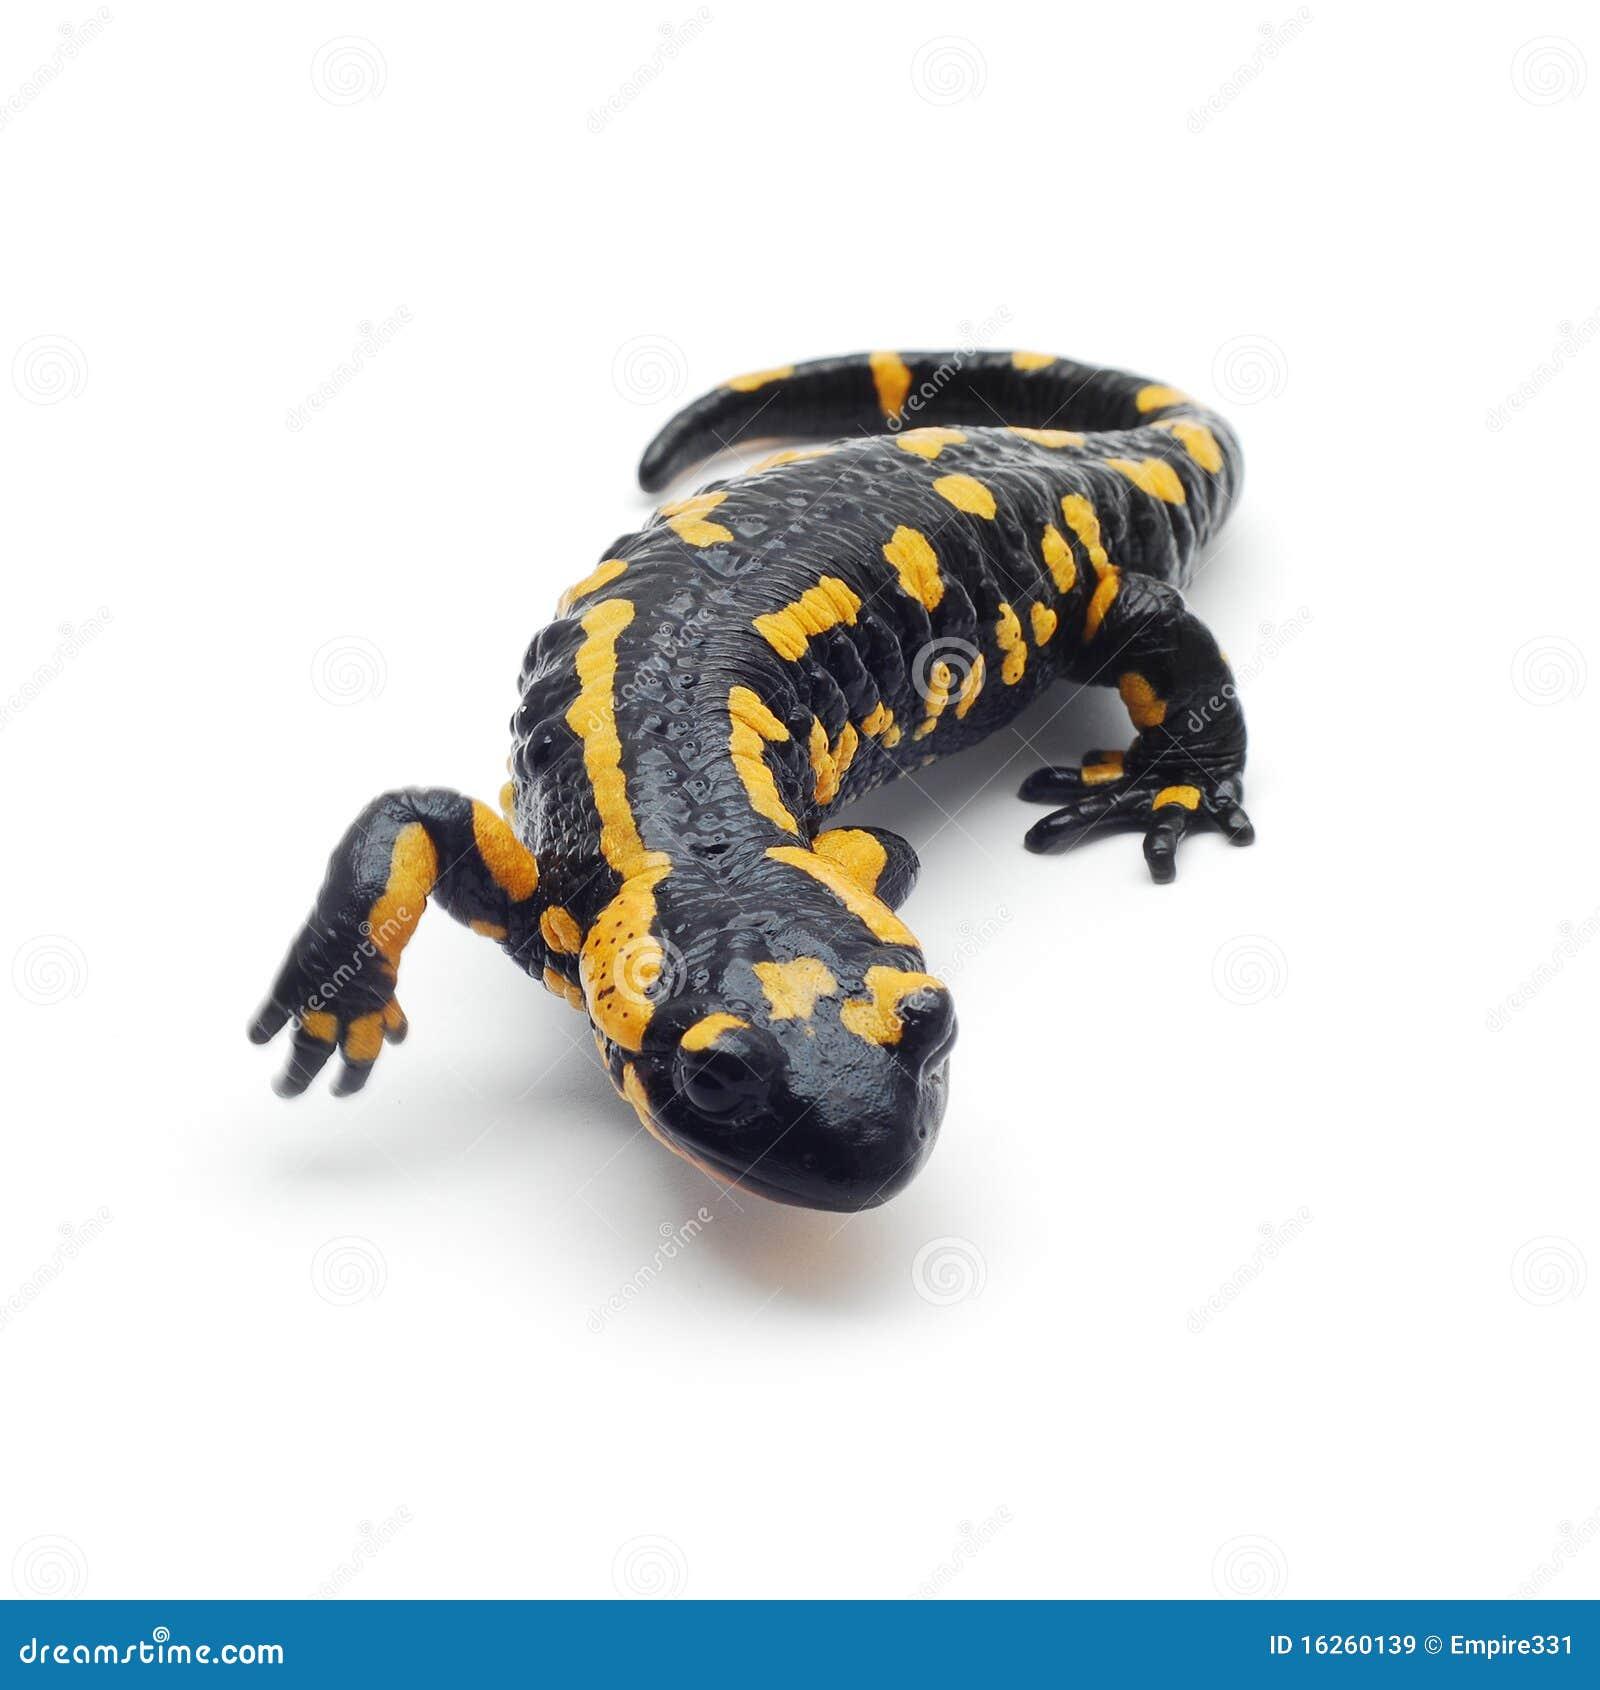 salamander white background - photo #7